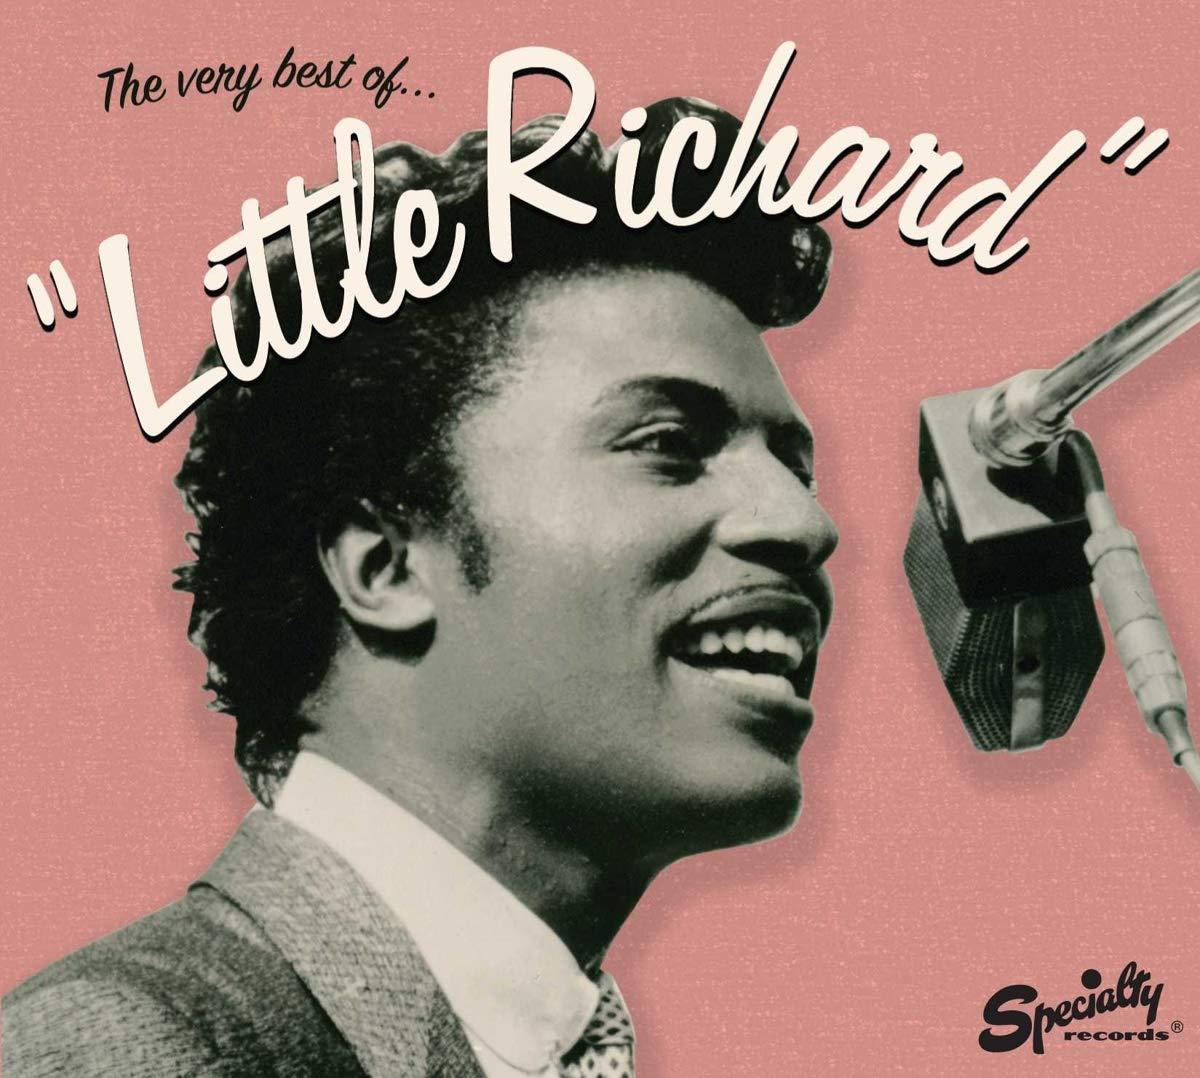 2018 little richard Here's Little